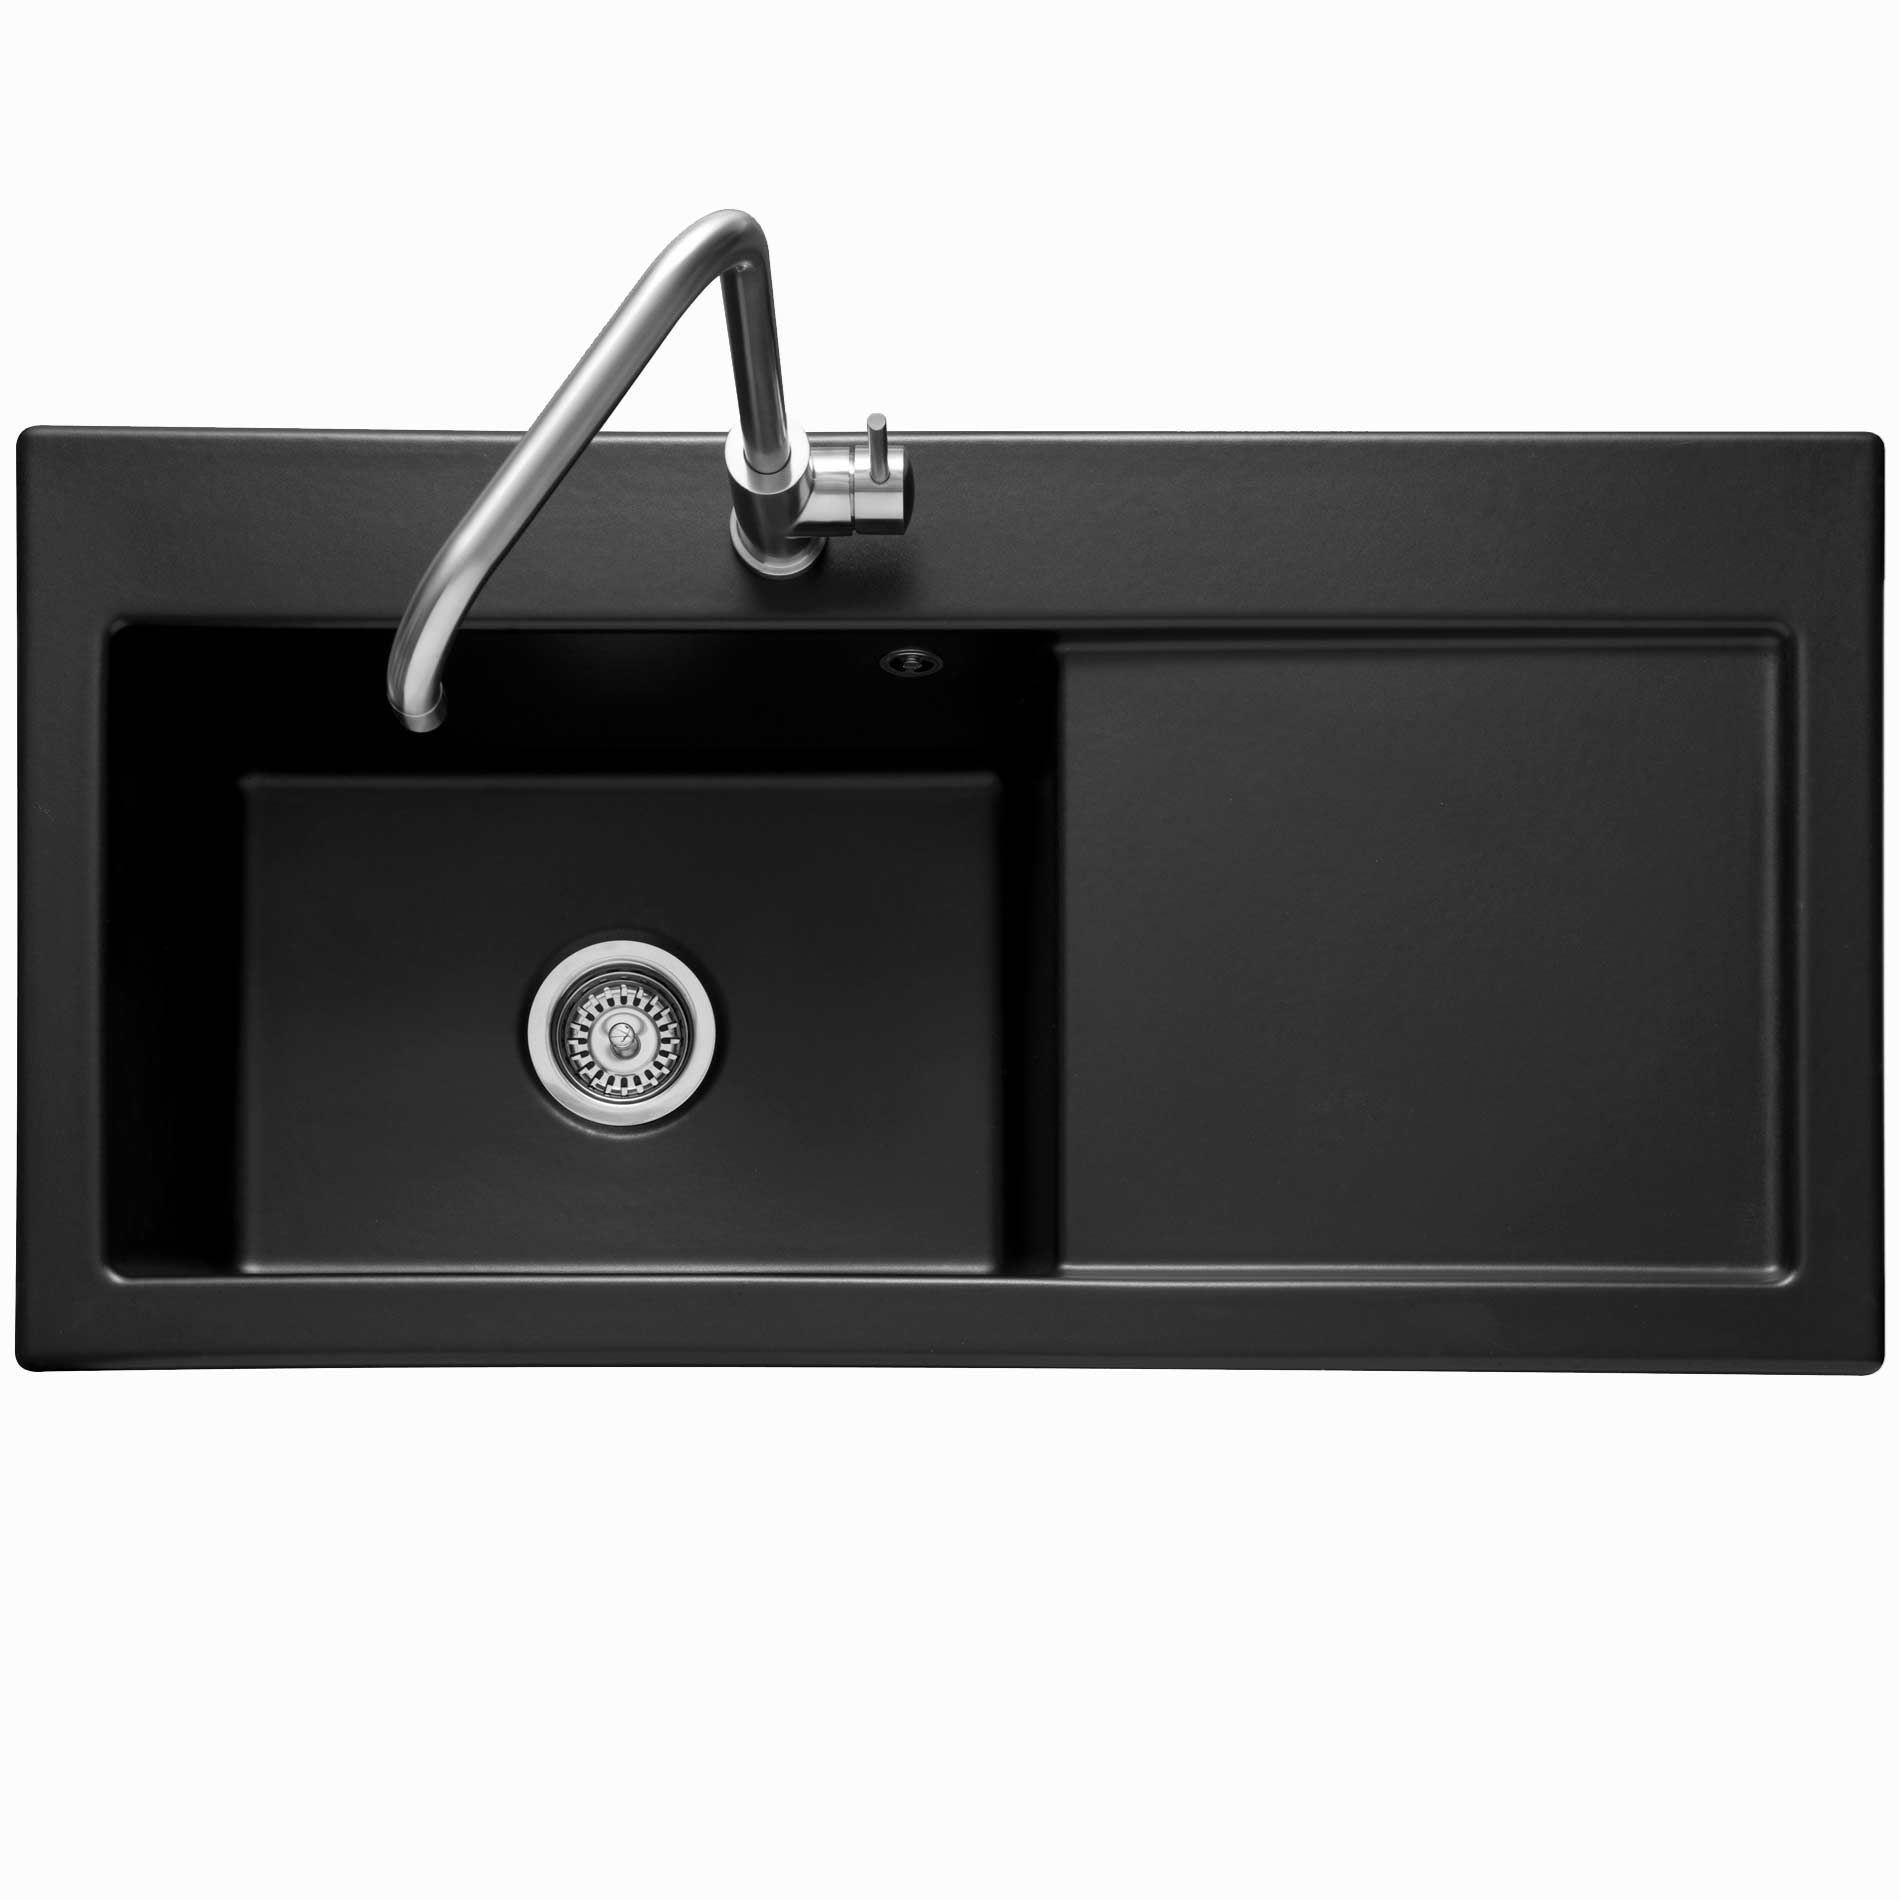 Caple Avalon 100 Black Ceramic Sink Kitchen Sinks & Taps